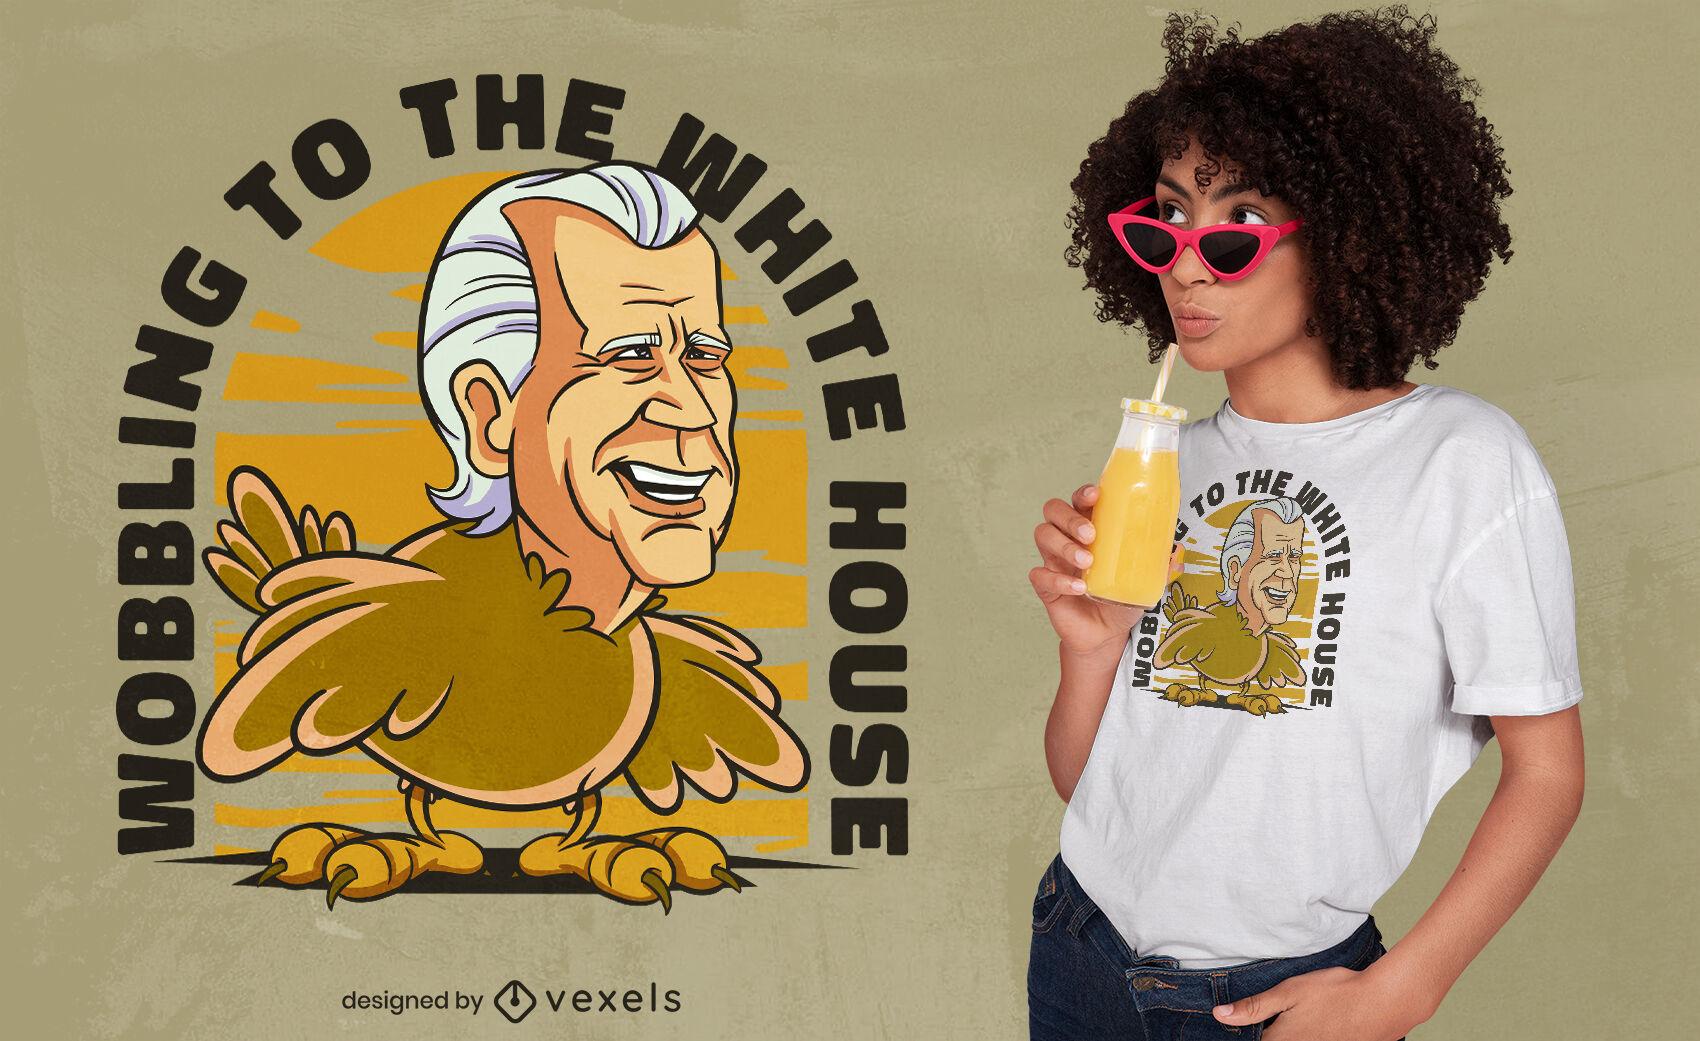 Turkey politician parody t-shirt design